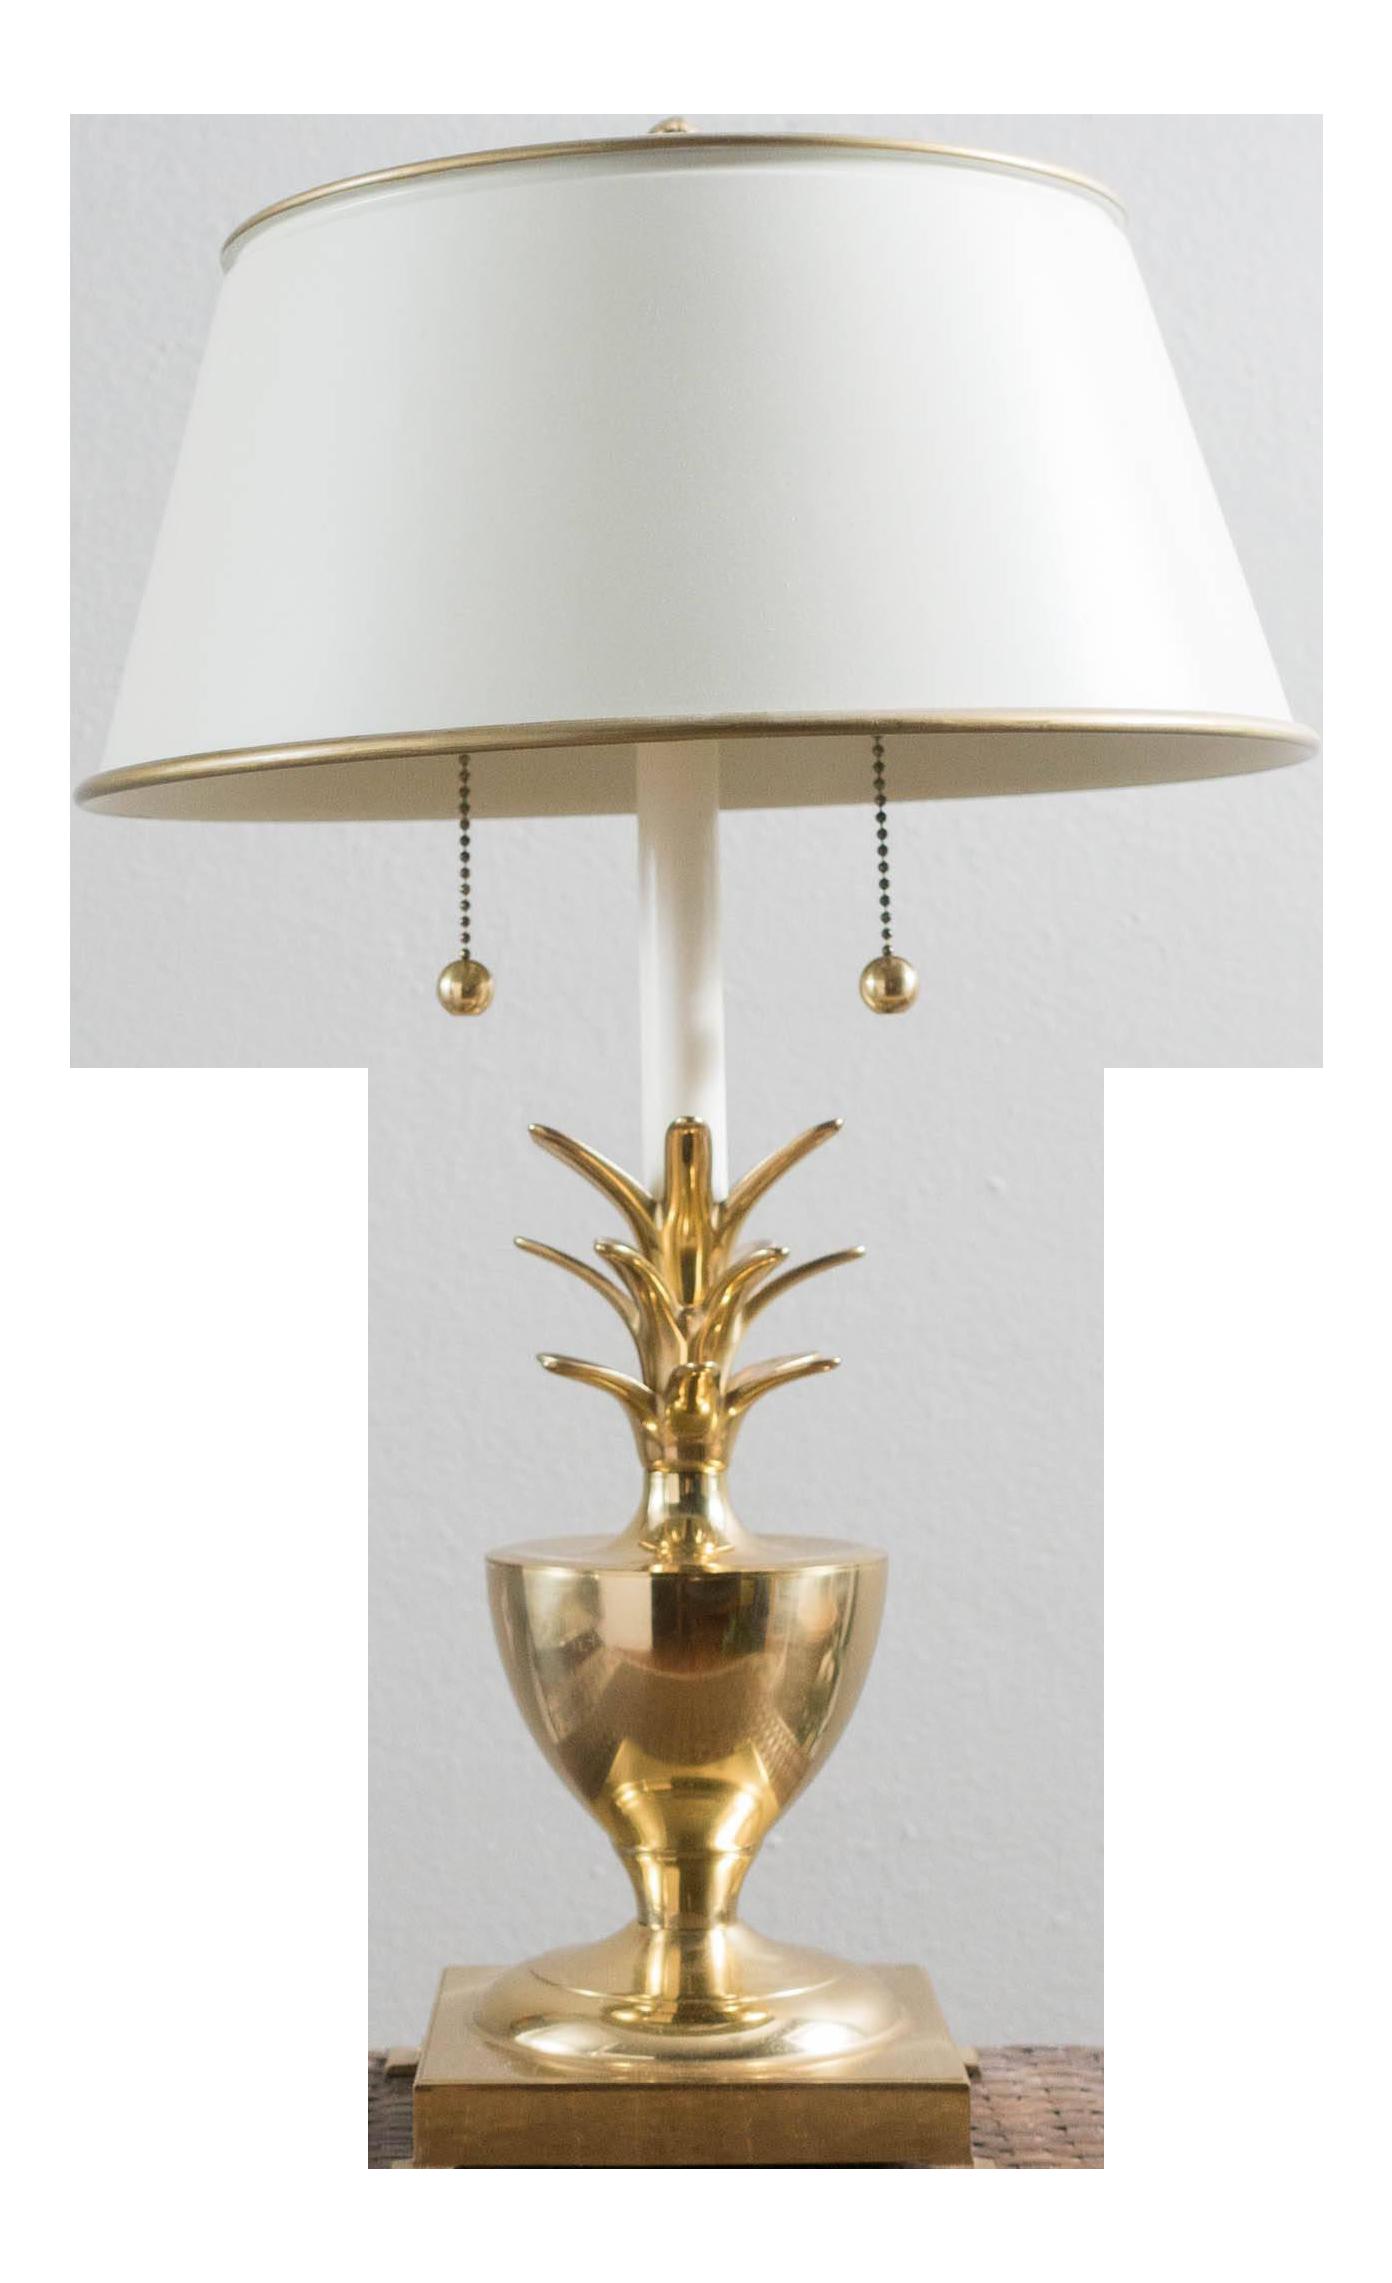 Vintage Brass Pineapple Table Lamp